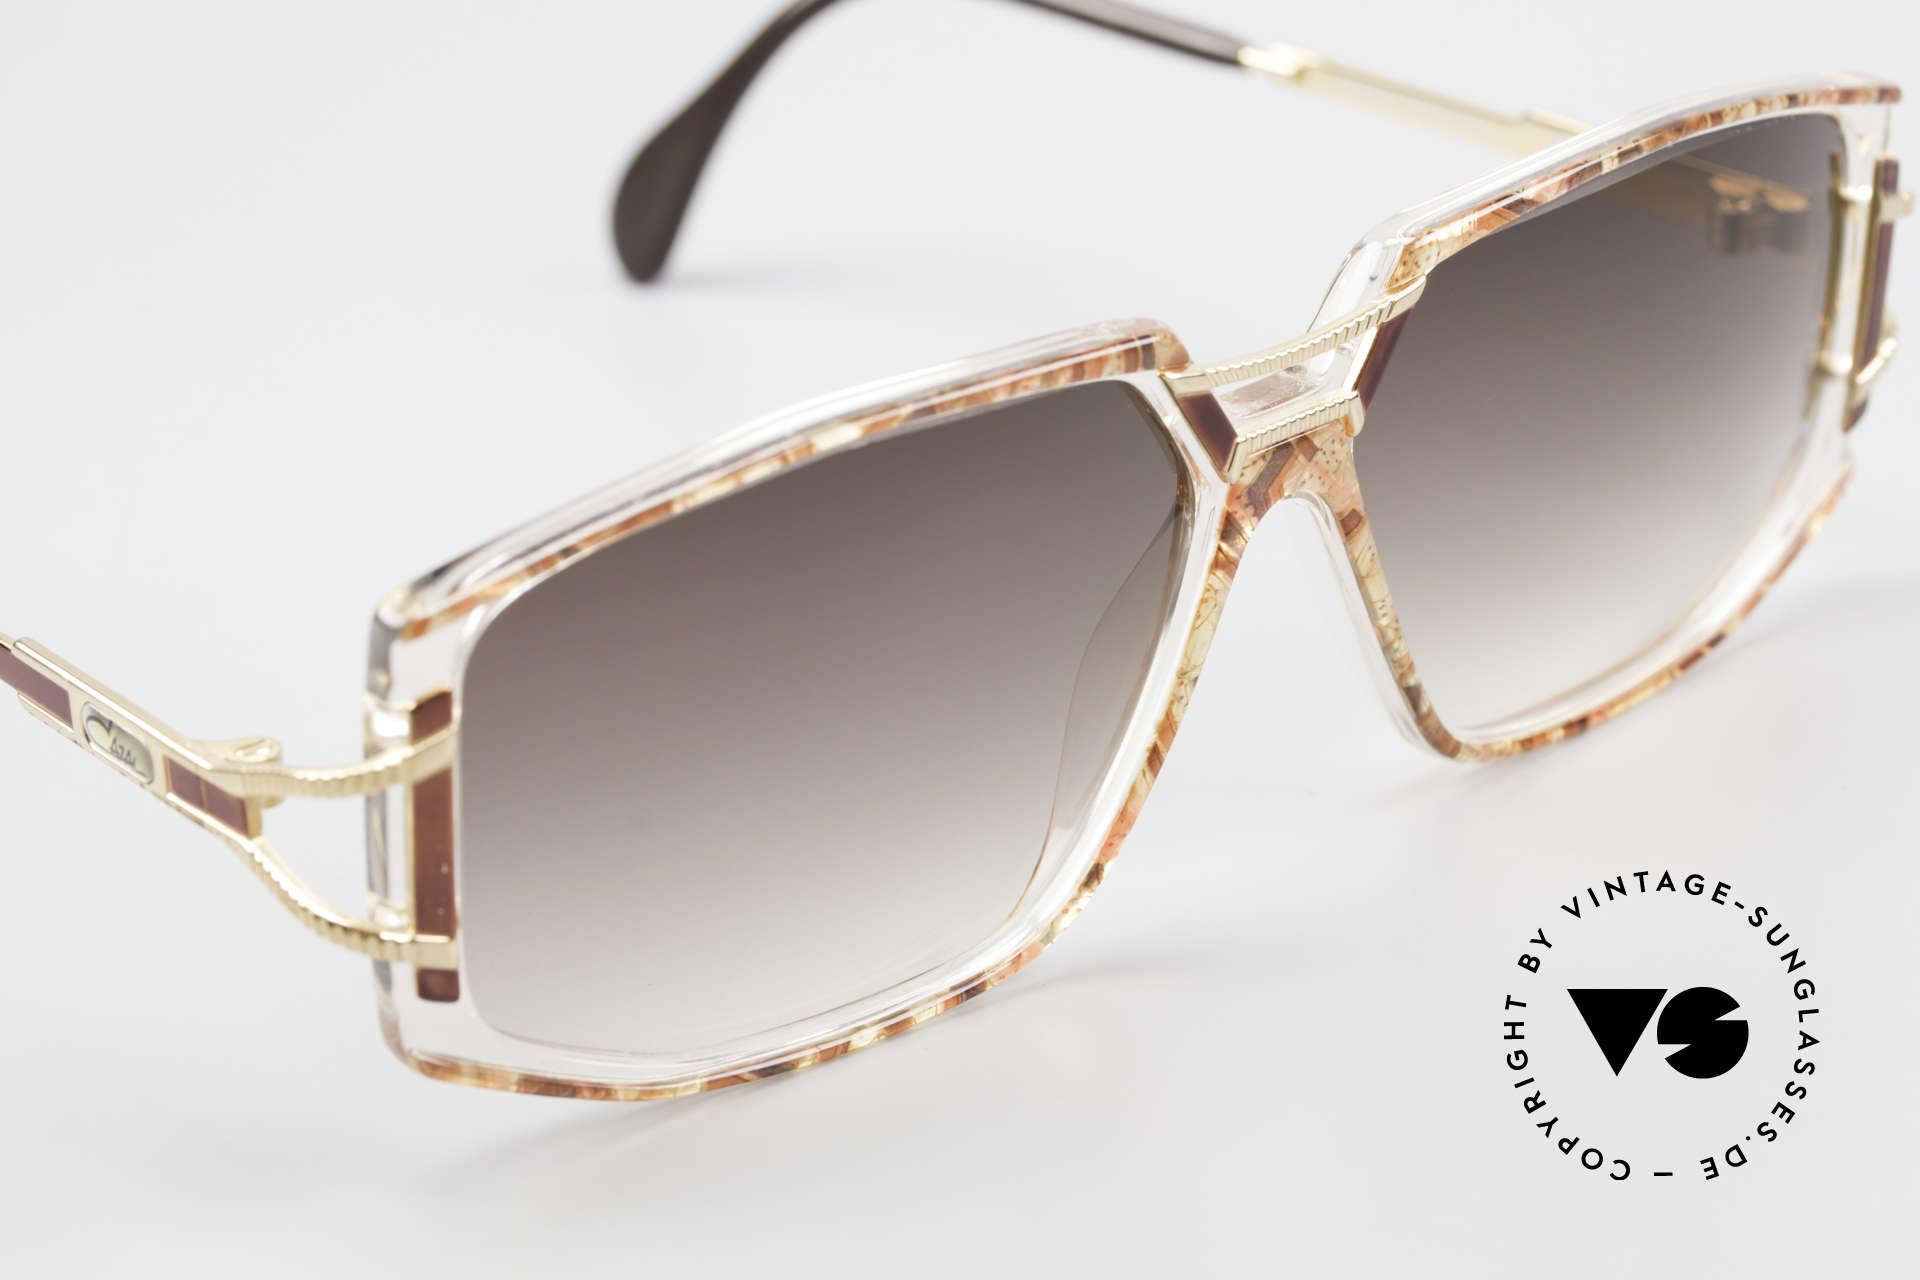 Cazal 362 Ladies Sunglasses 90's Cazal, never worn (like all our rare VINTAGE CAZAL eyewear), Made for Women